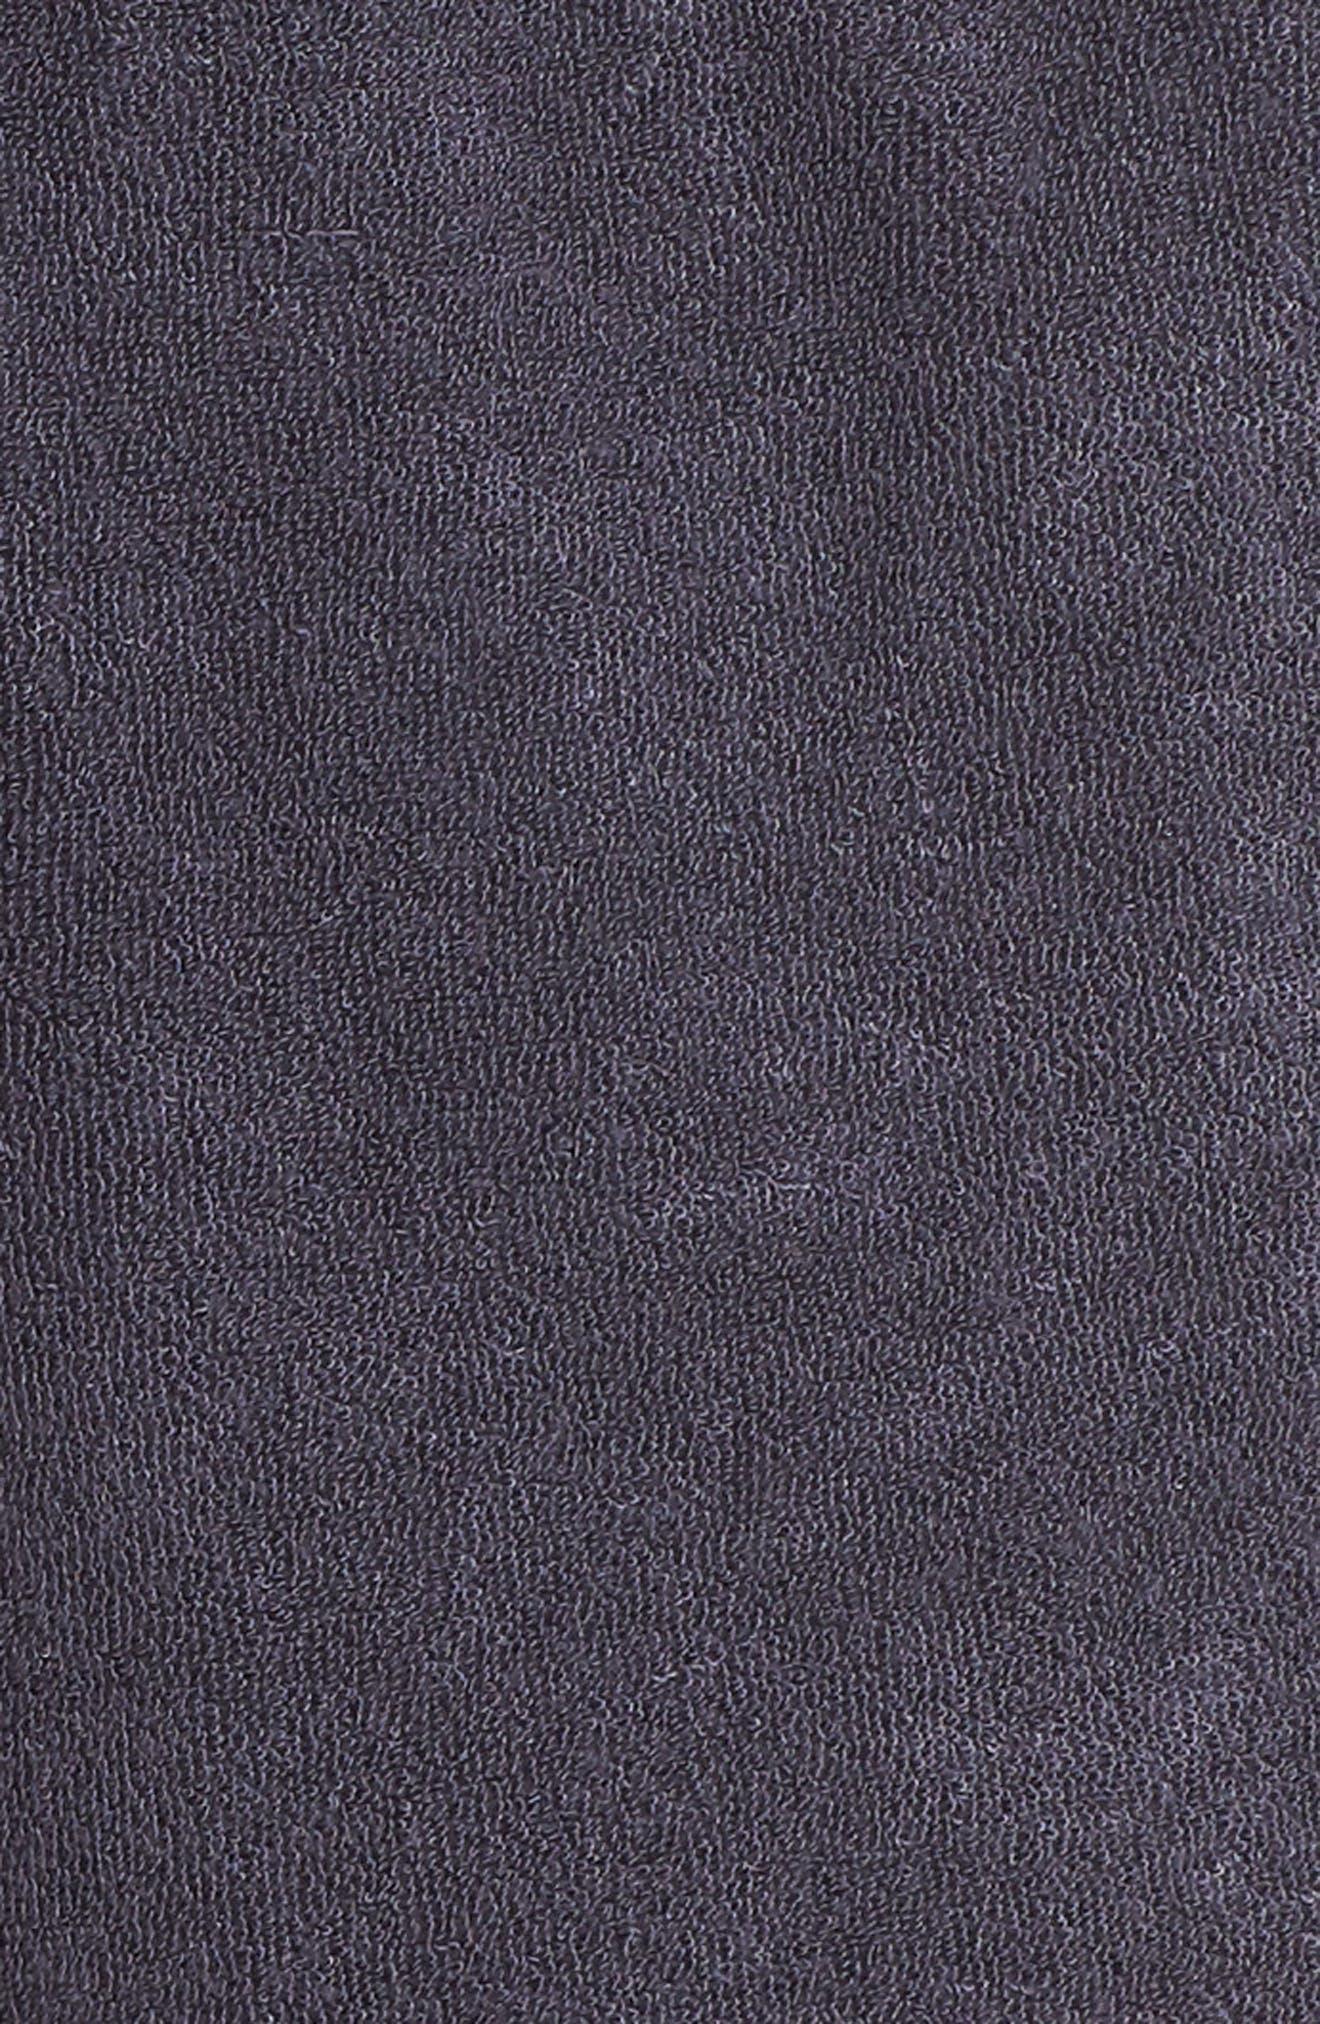 Spa Shorts,                             Alternate thumbnail 6, color,                             021